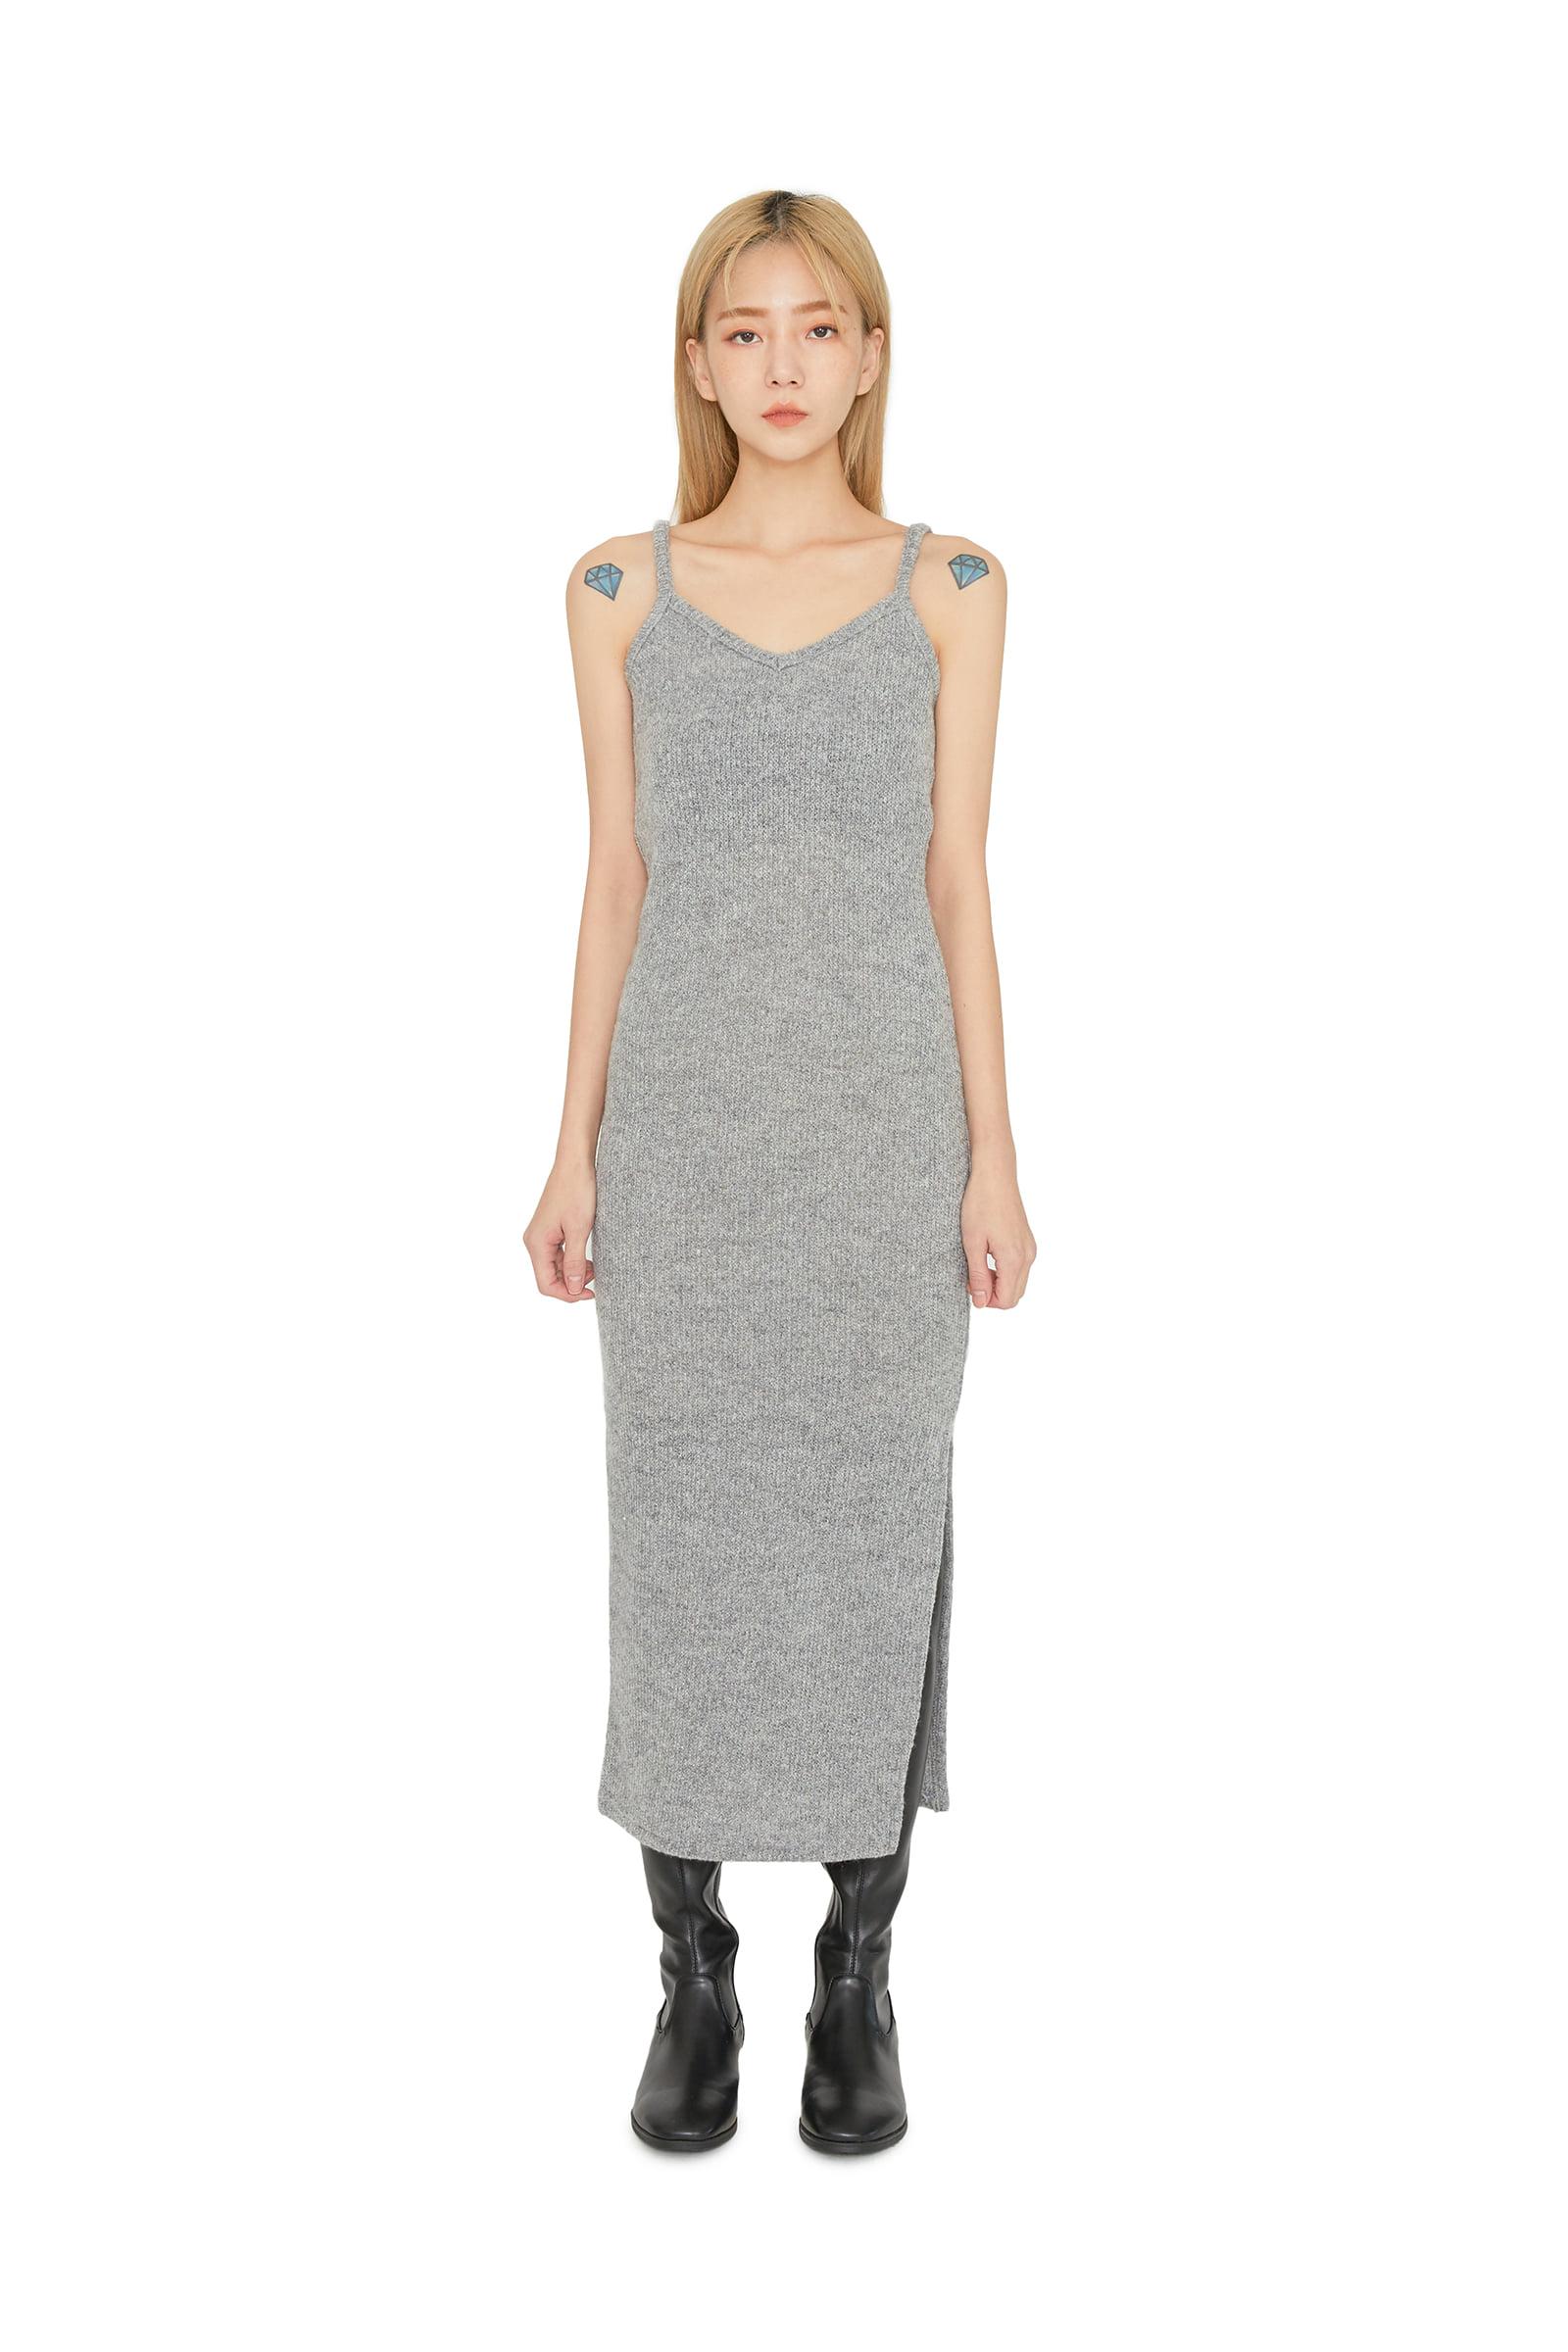 Shua slit-knit midi dress